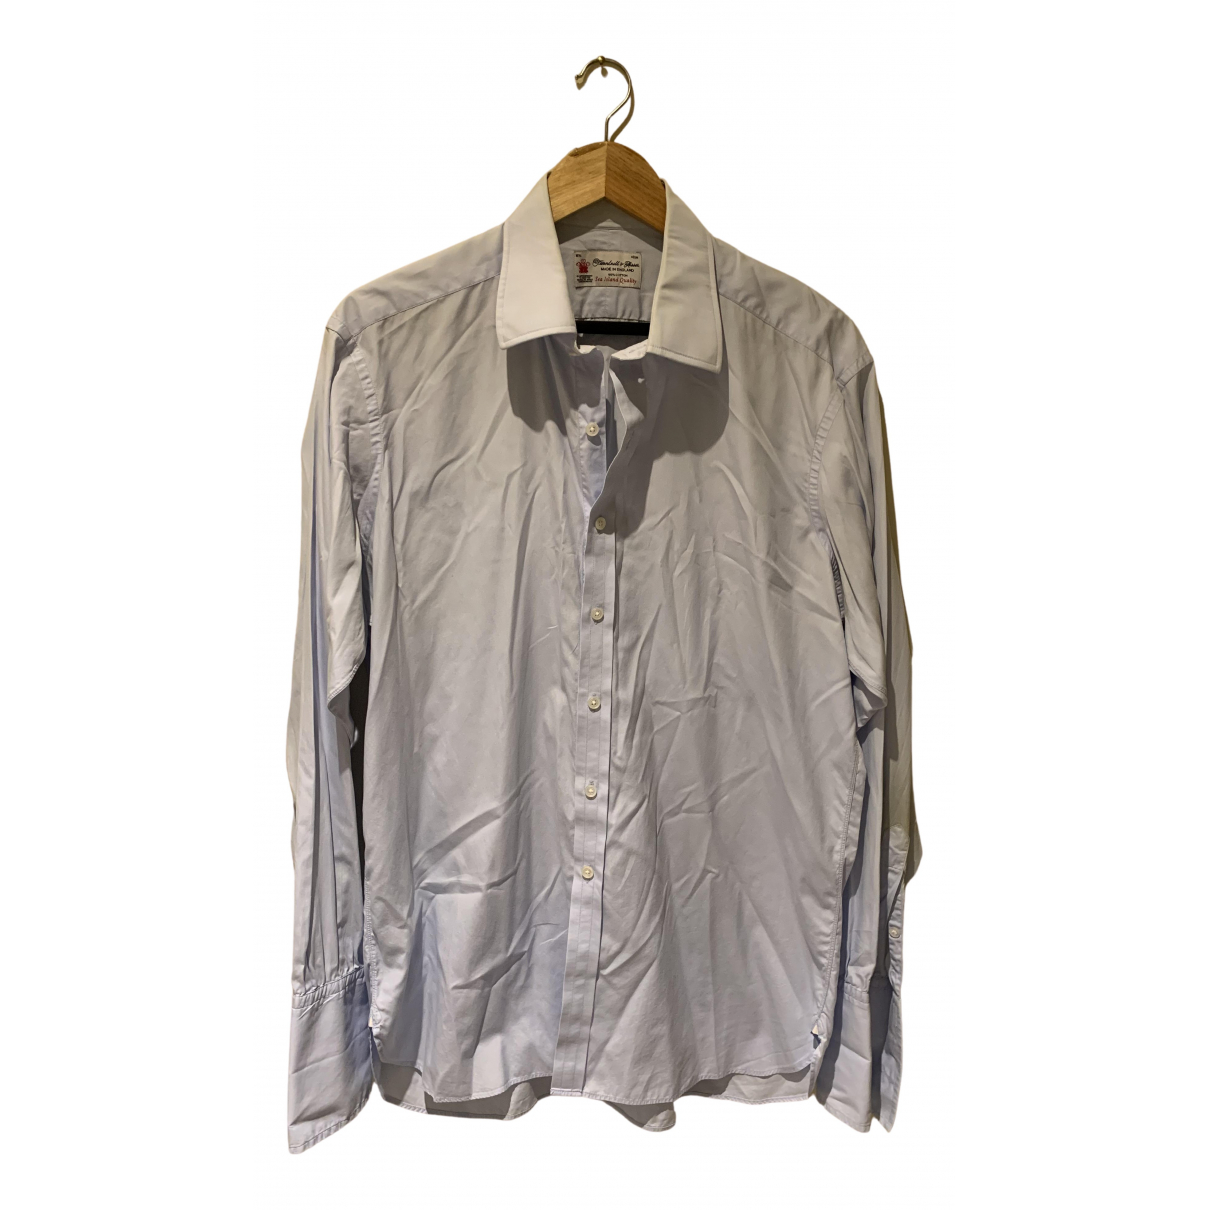 Camisas Turnbull & Asser